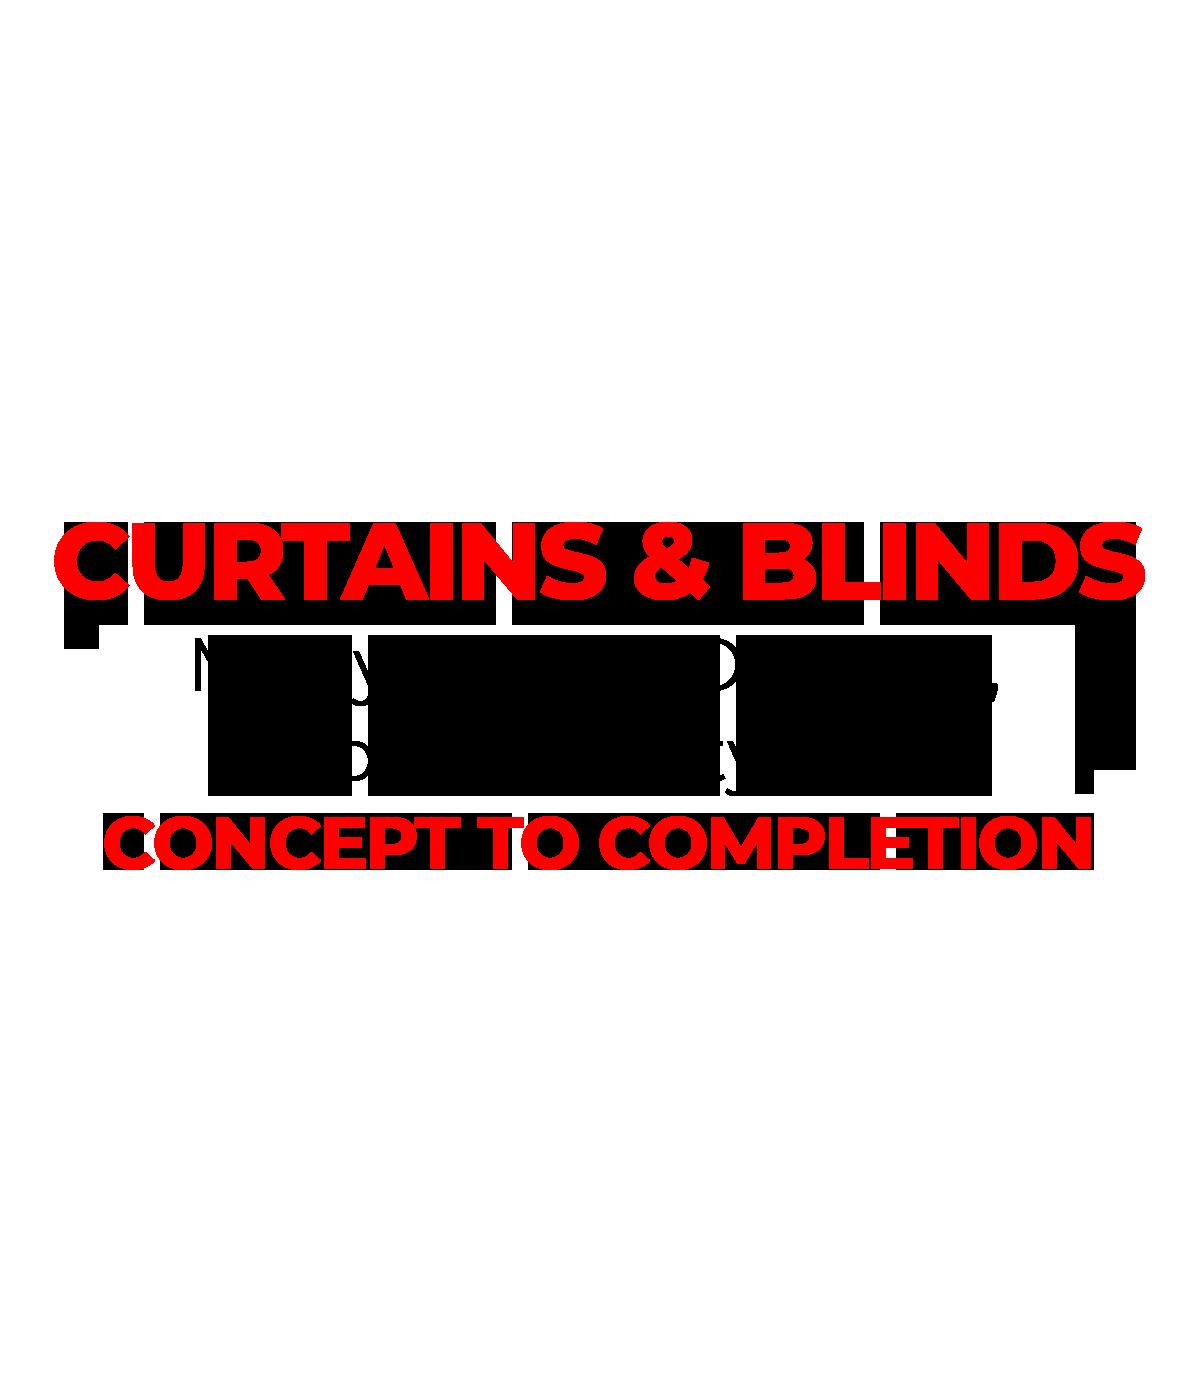 https://www.prapalexports.com/wp-content/uploads/2020/03/curtains-text.png